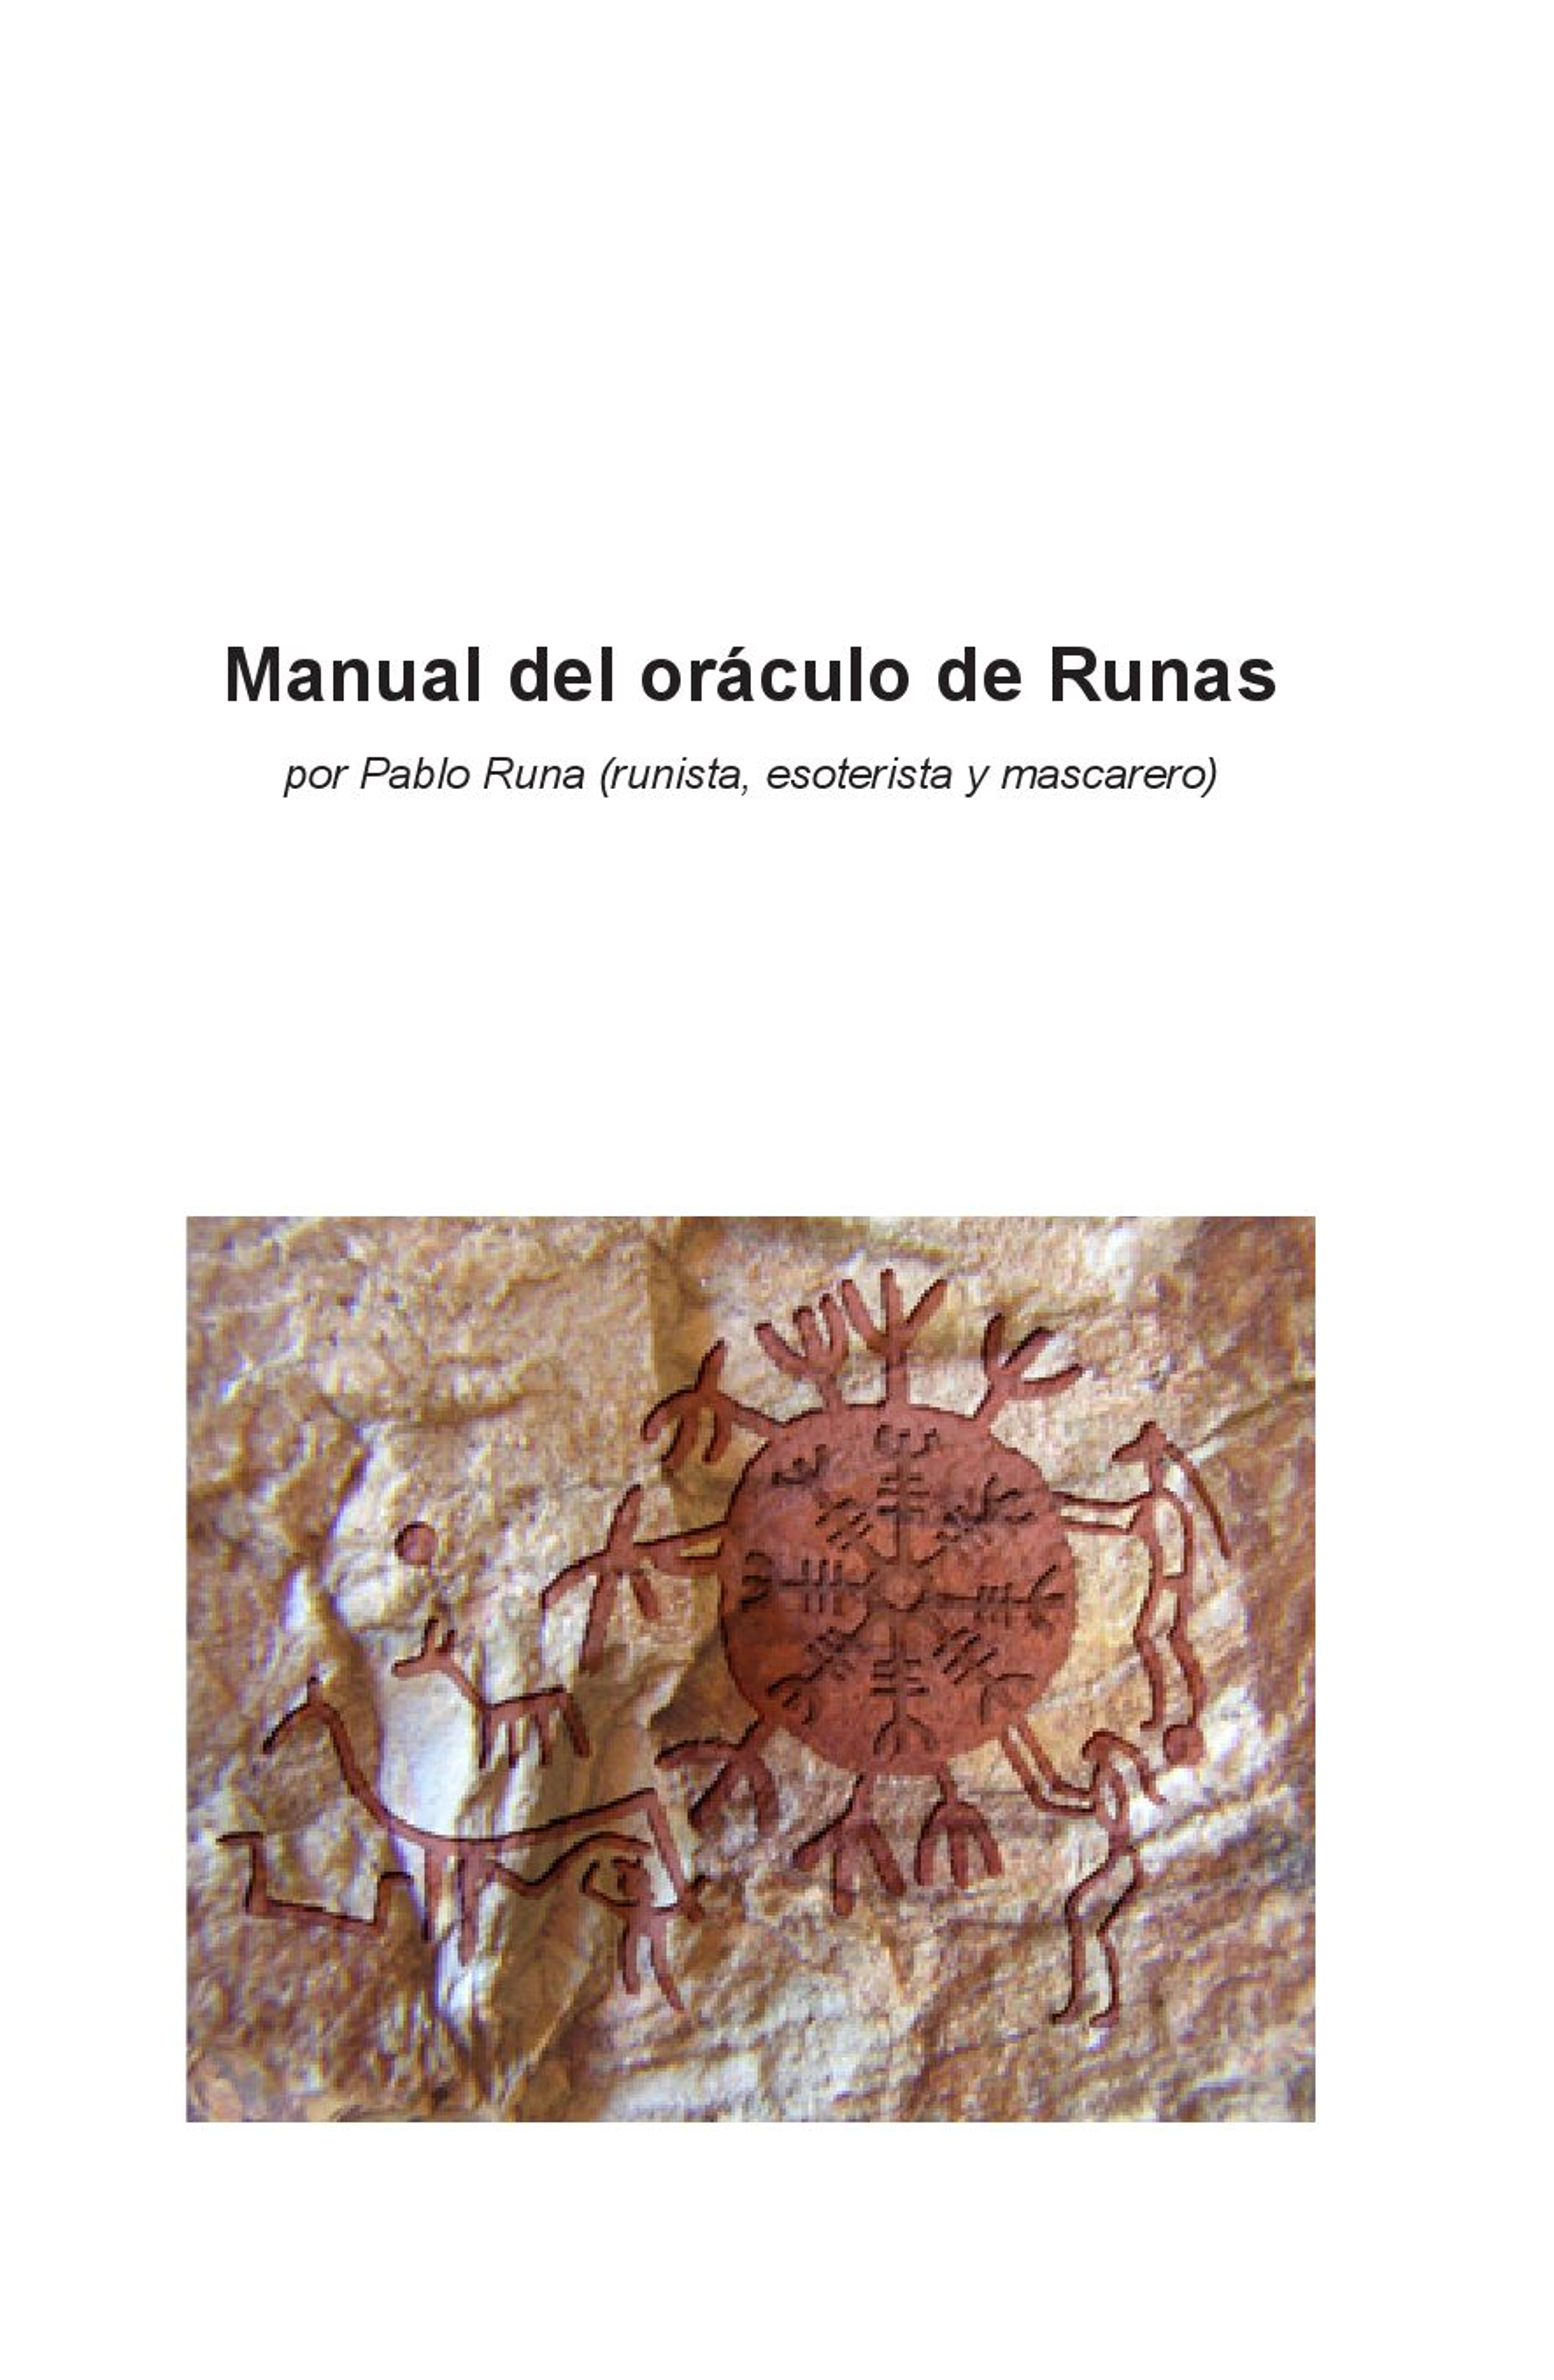 manual de runas by Pablo Runa - issuu